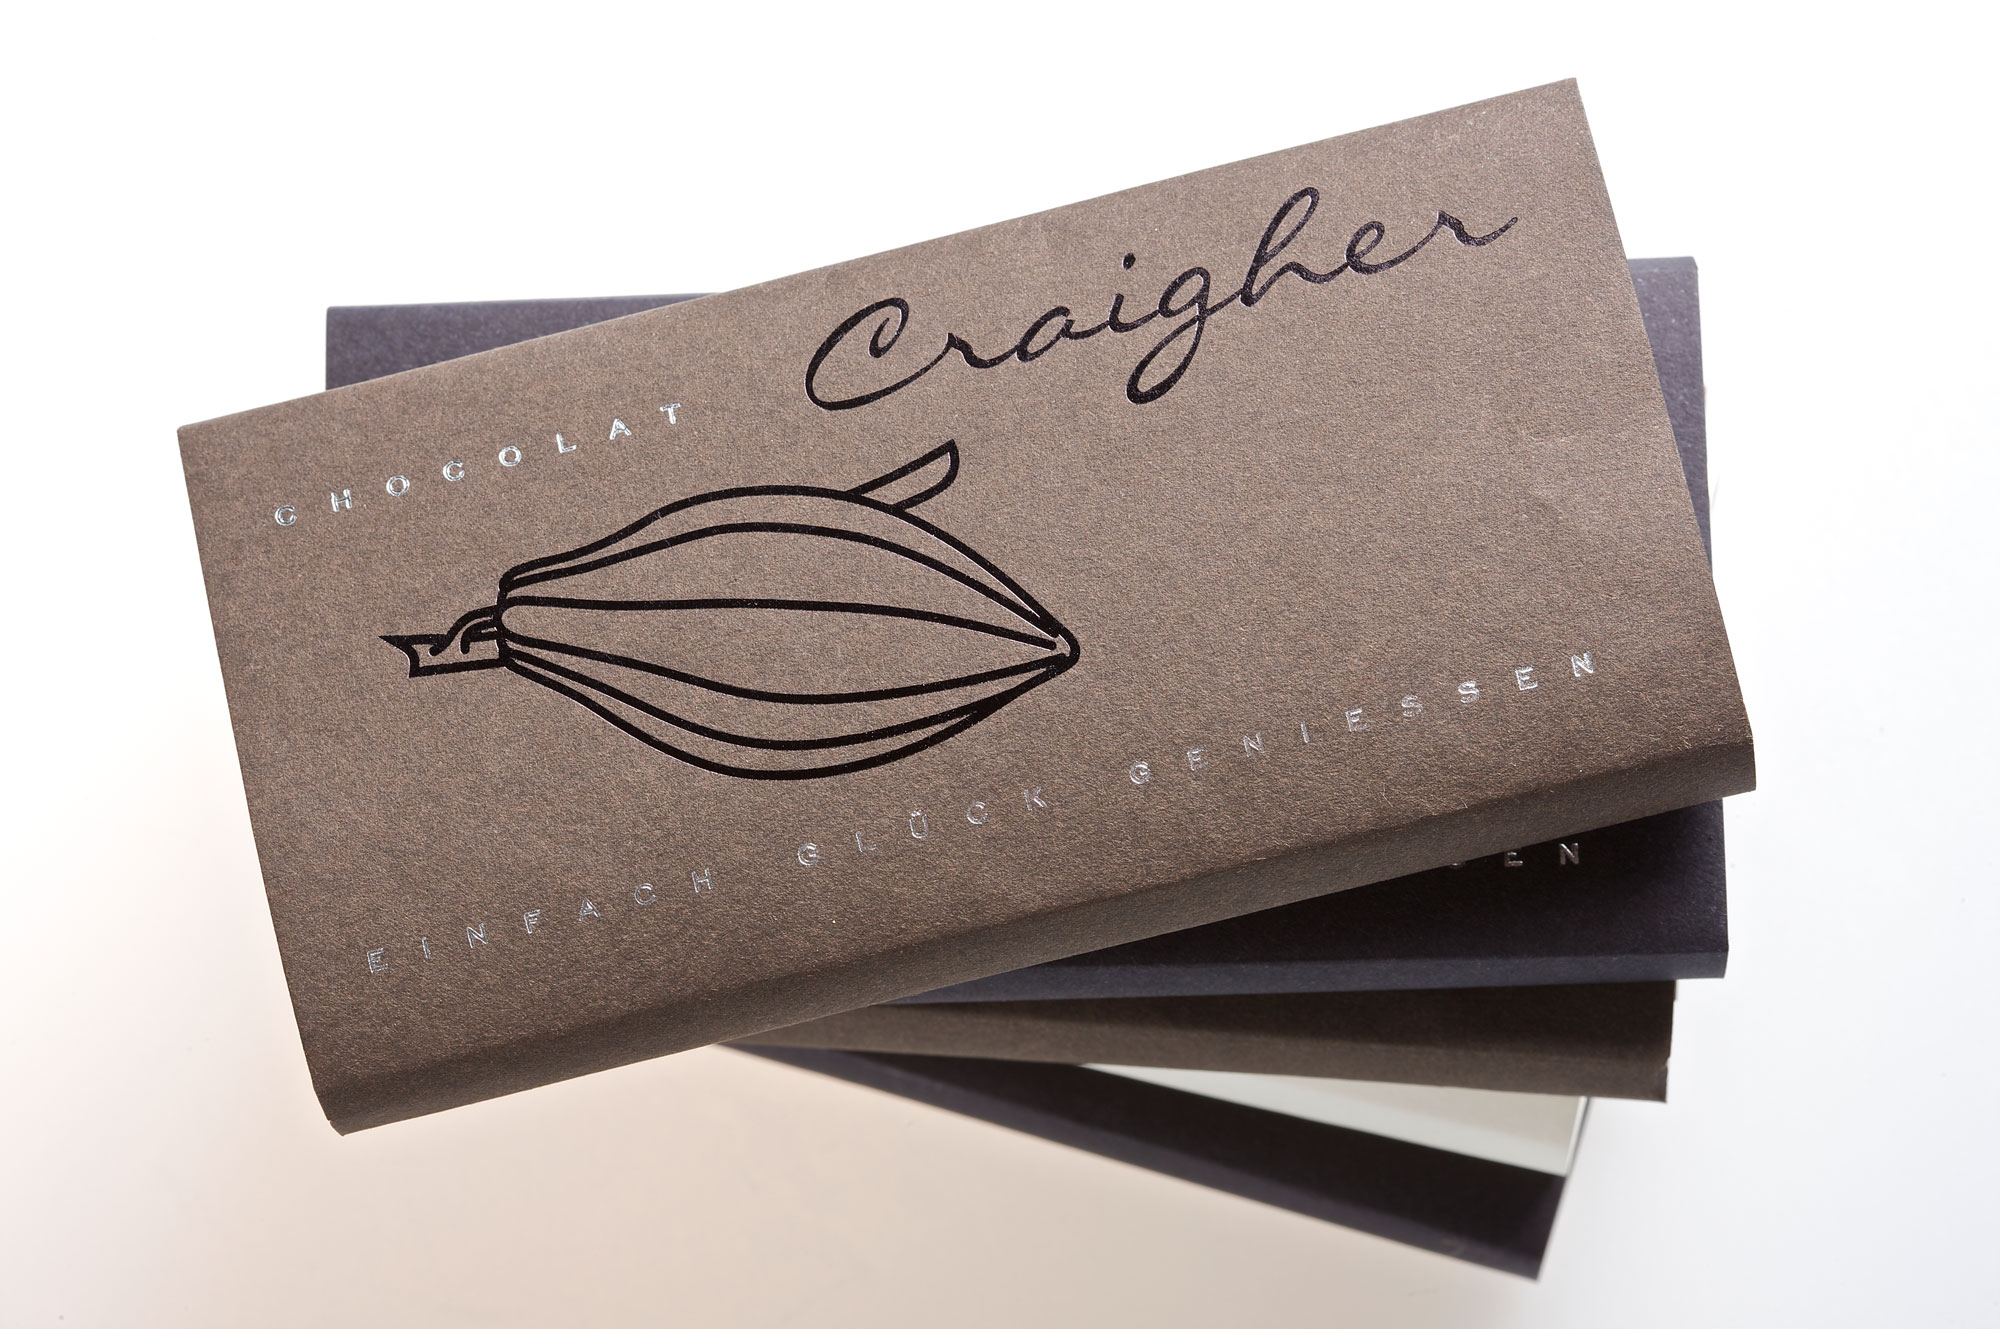 Craigher-Schokolade-2009-03-16_106---Arbeitskopie-2